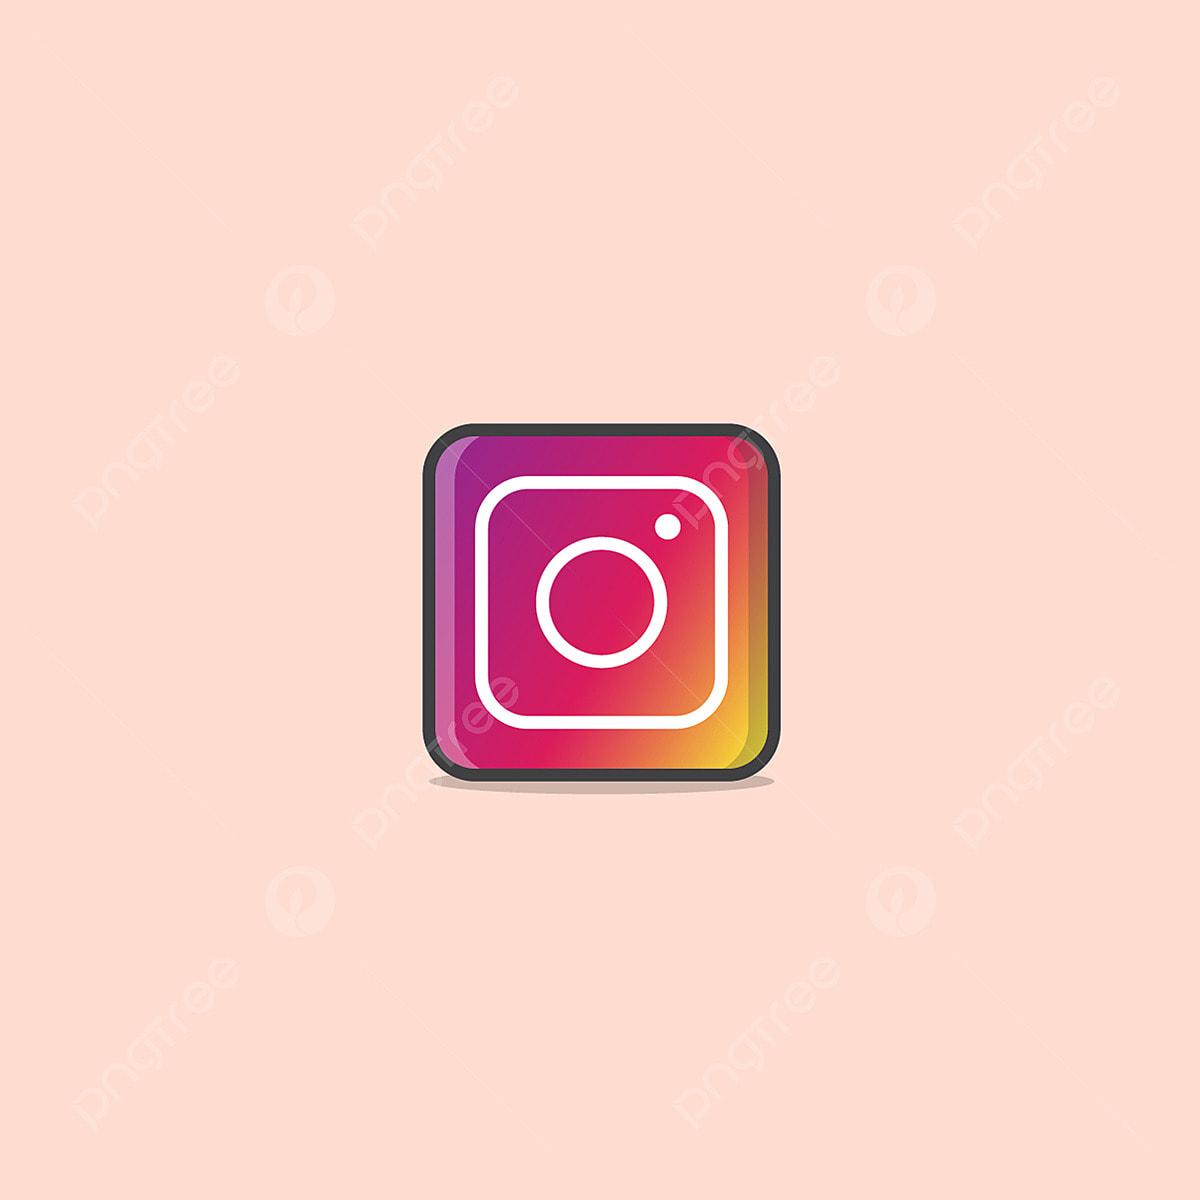 instagram cute airplane icon transparent background